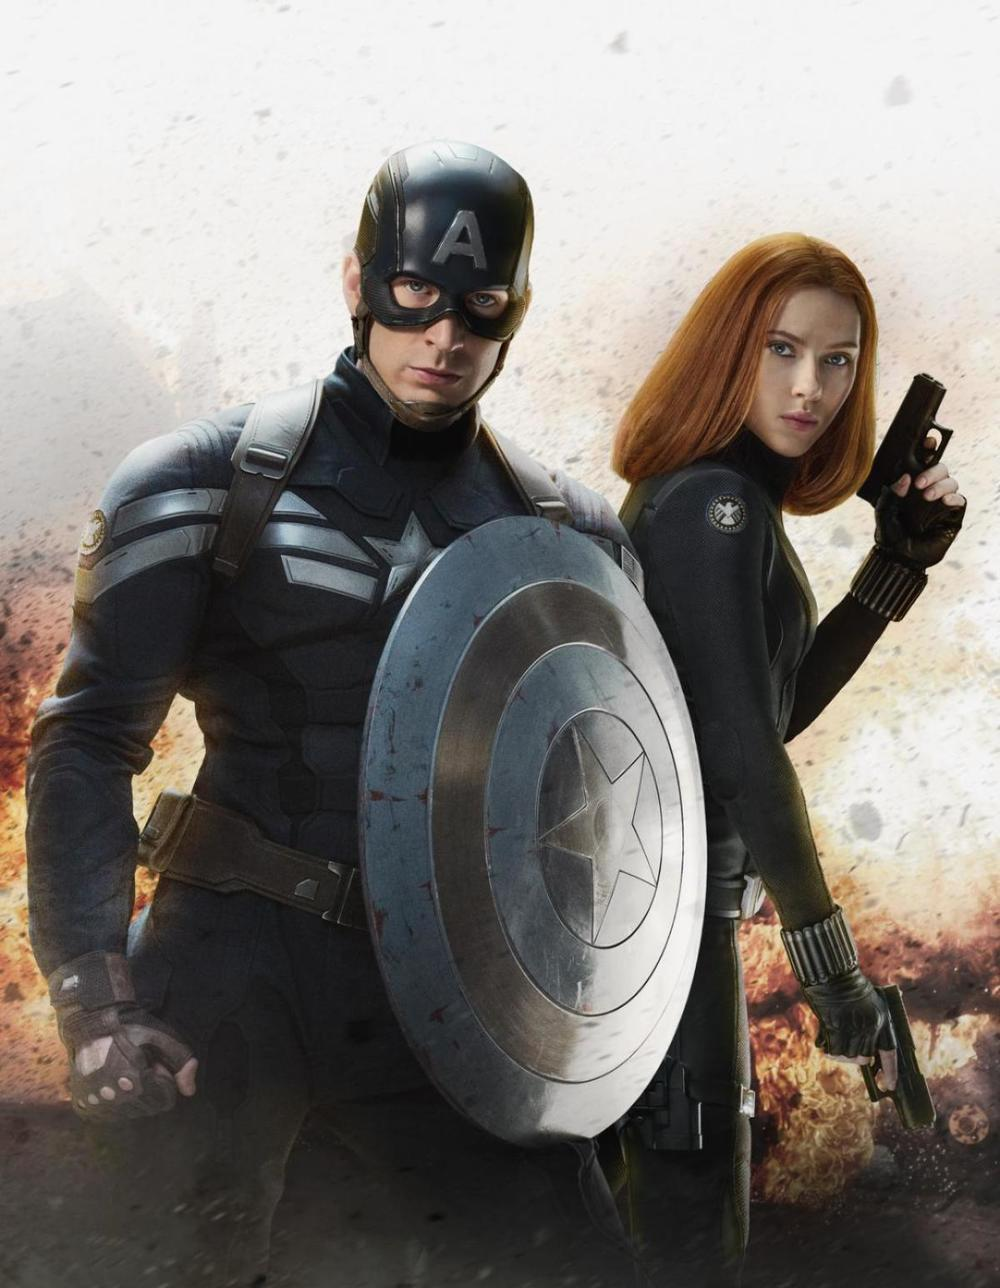 captain-america-the-winter-soldier-6-minute-featurette